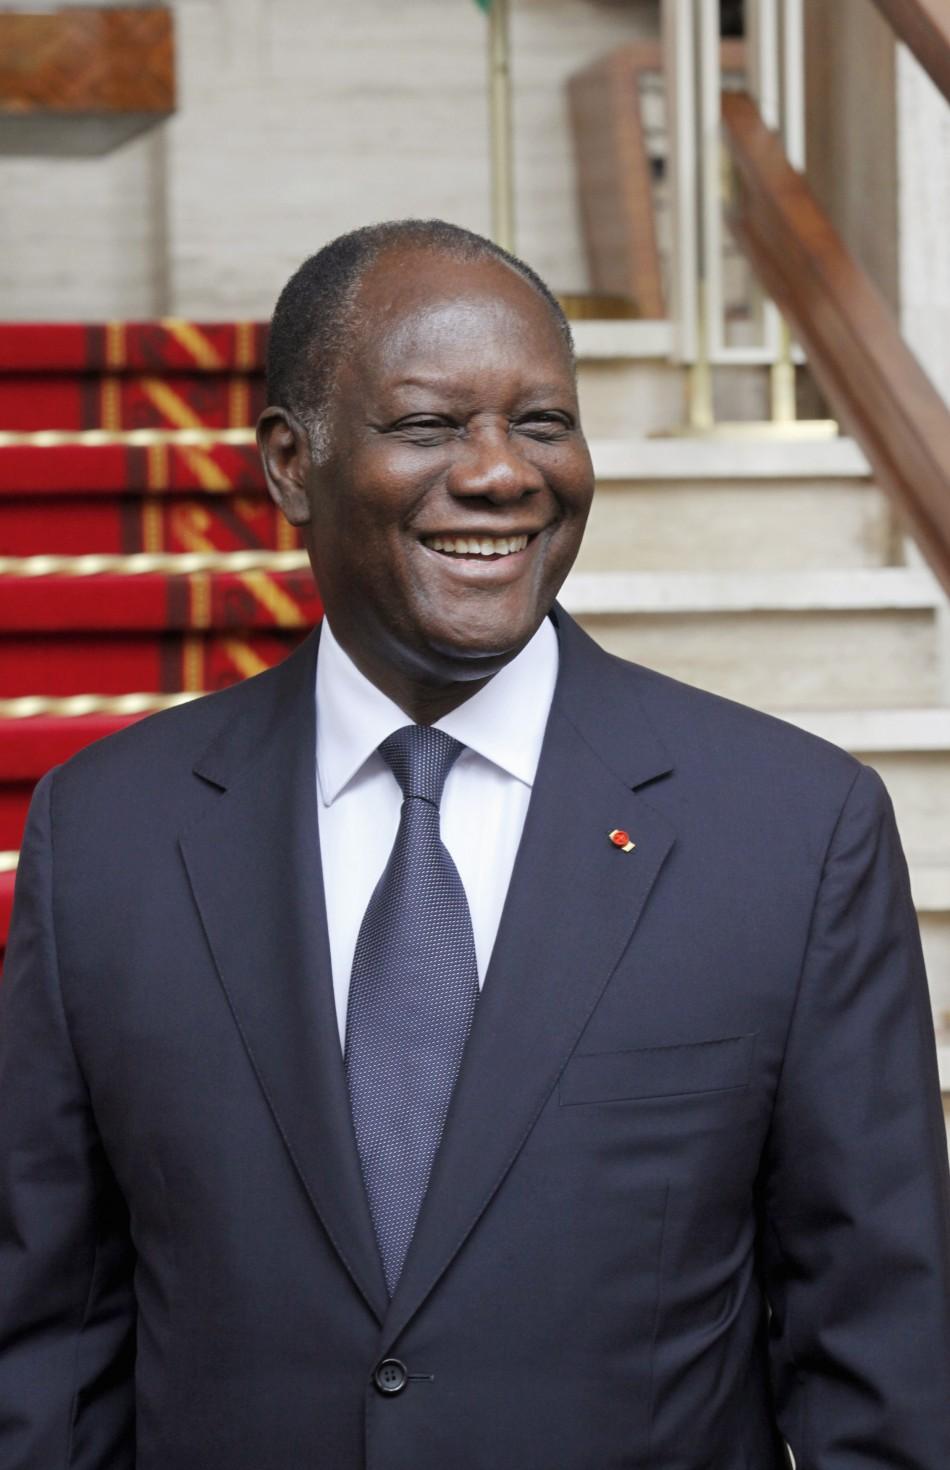 Ivory Coast's President Alassane Ouattara